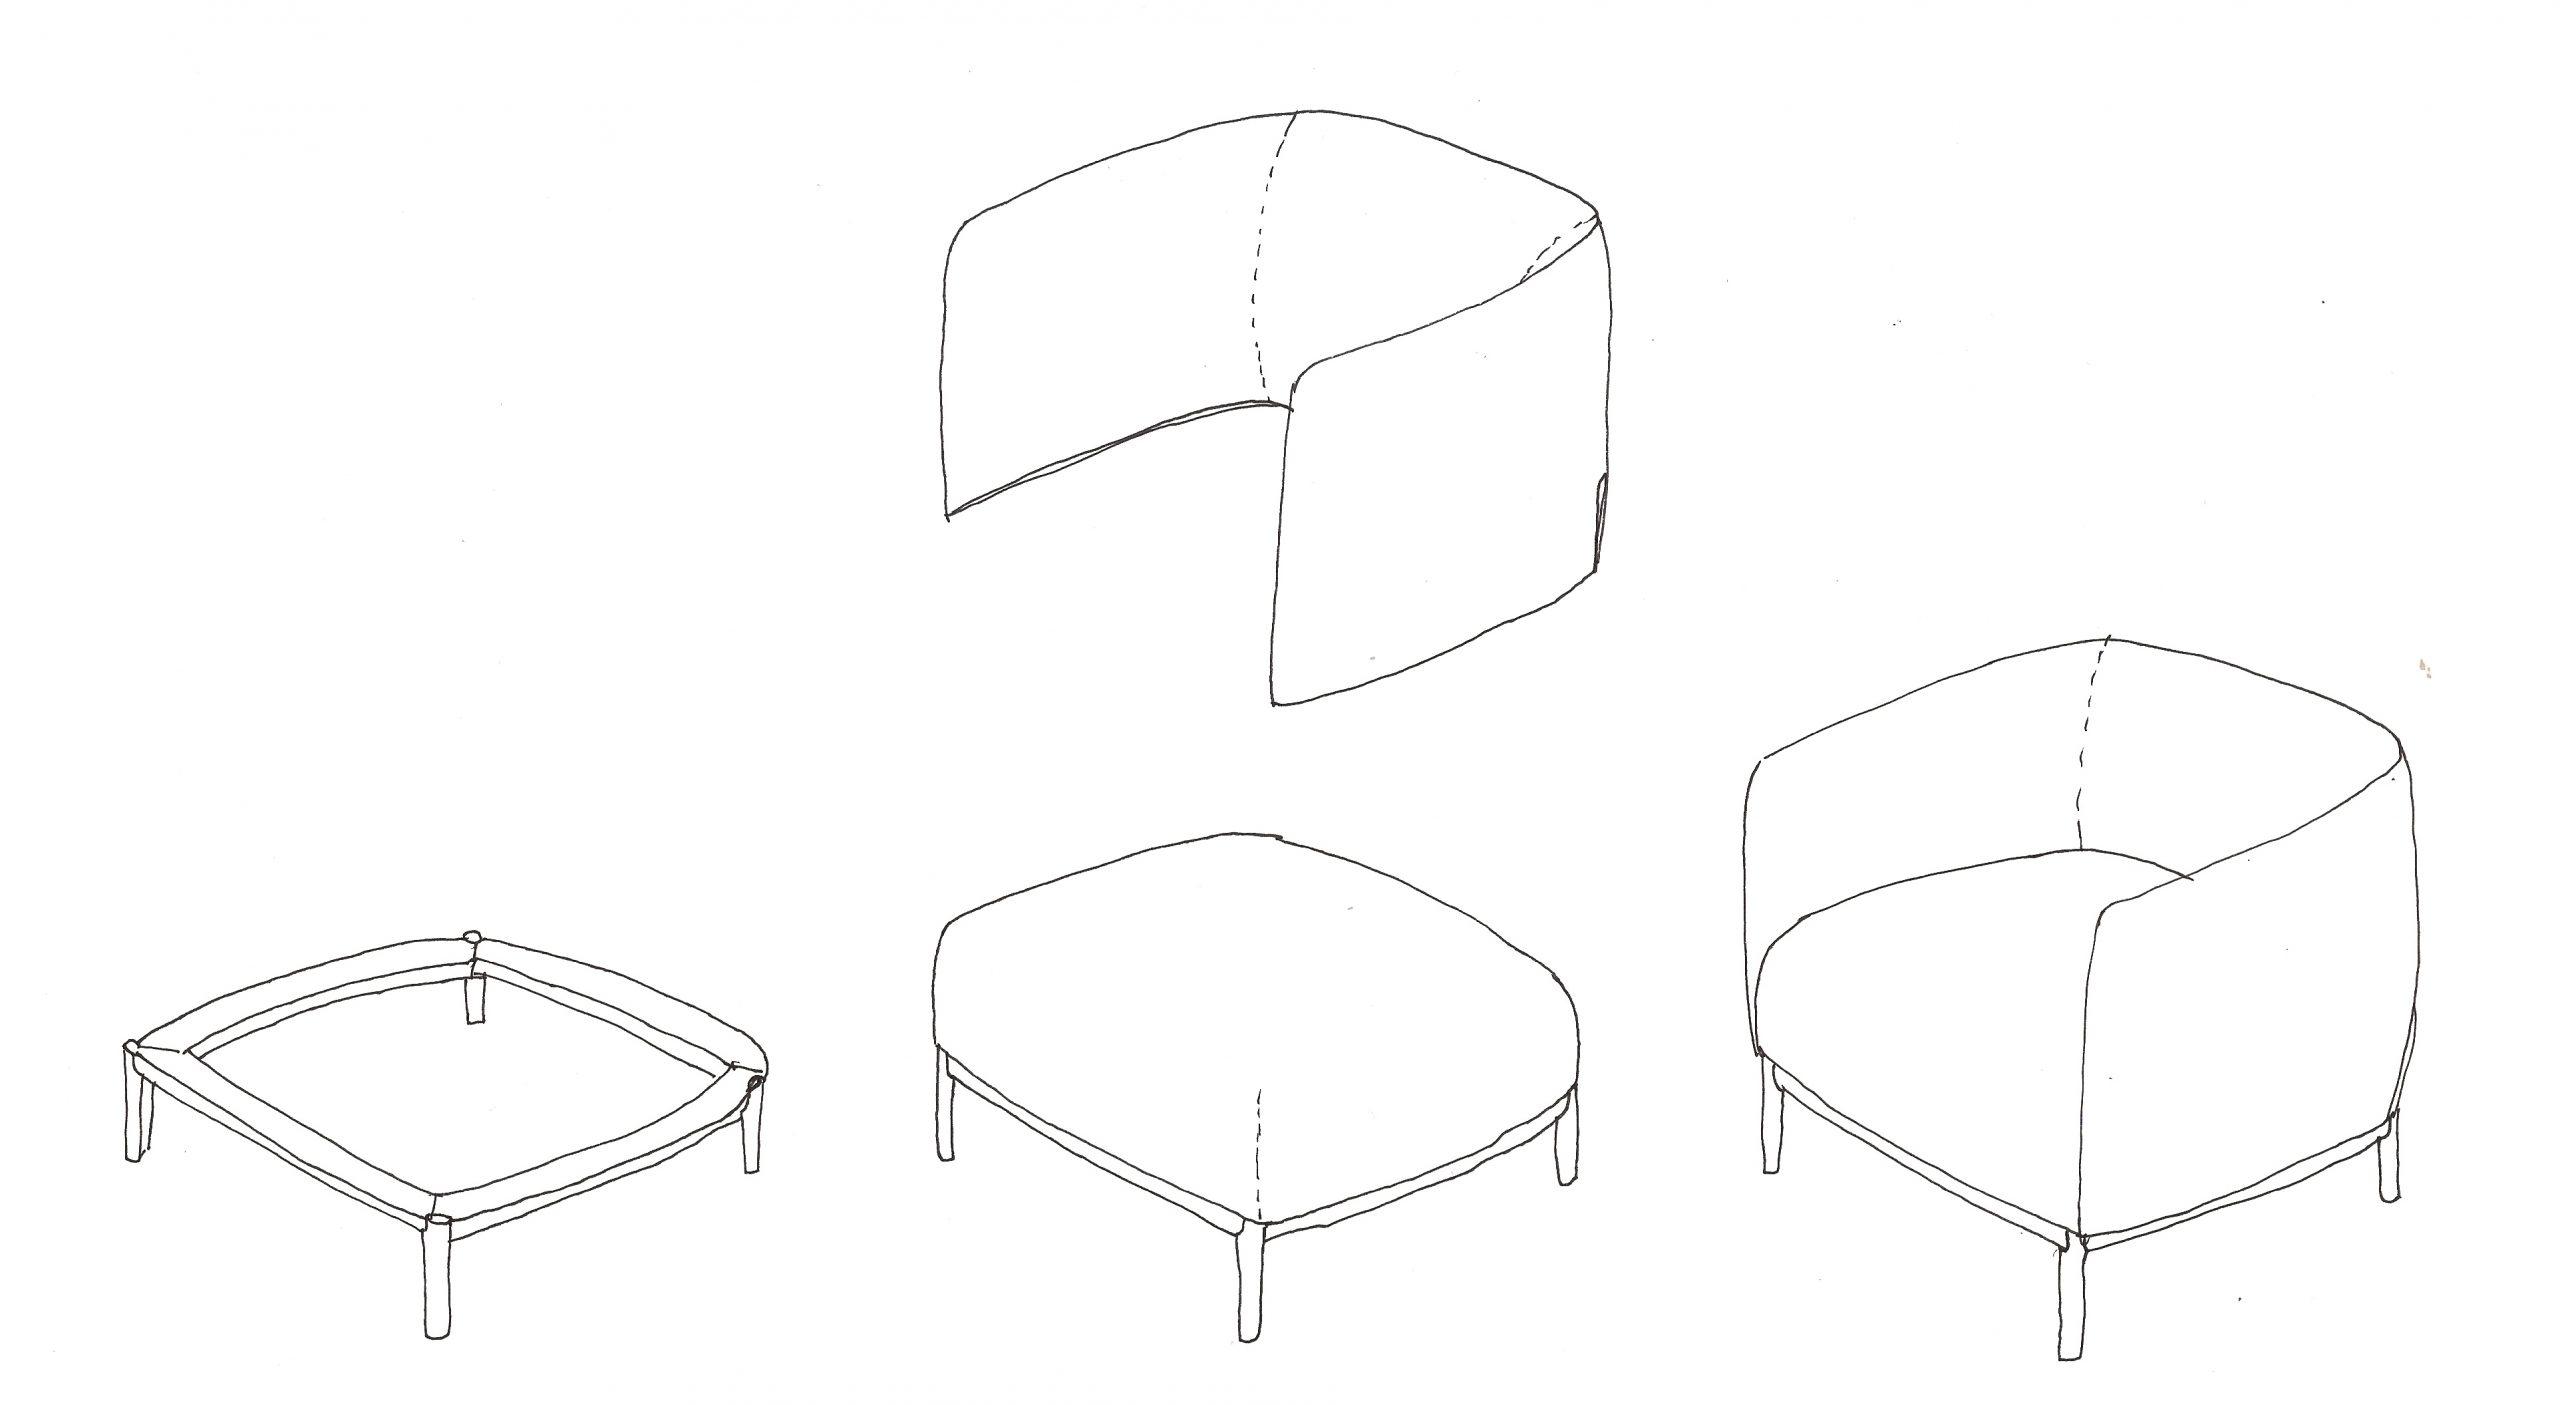 Sketch of Cape armchair by Debiasi Sandri for Tekhne